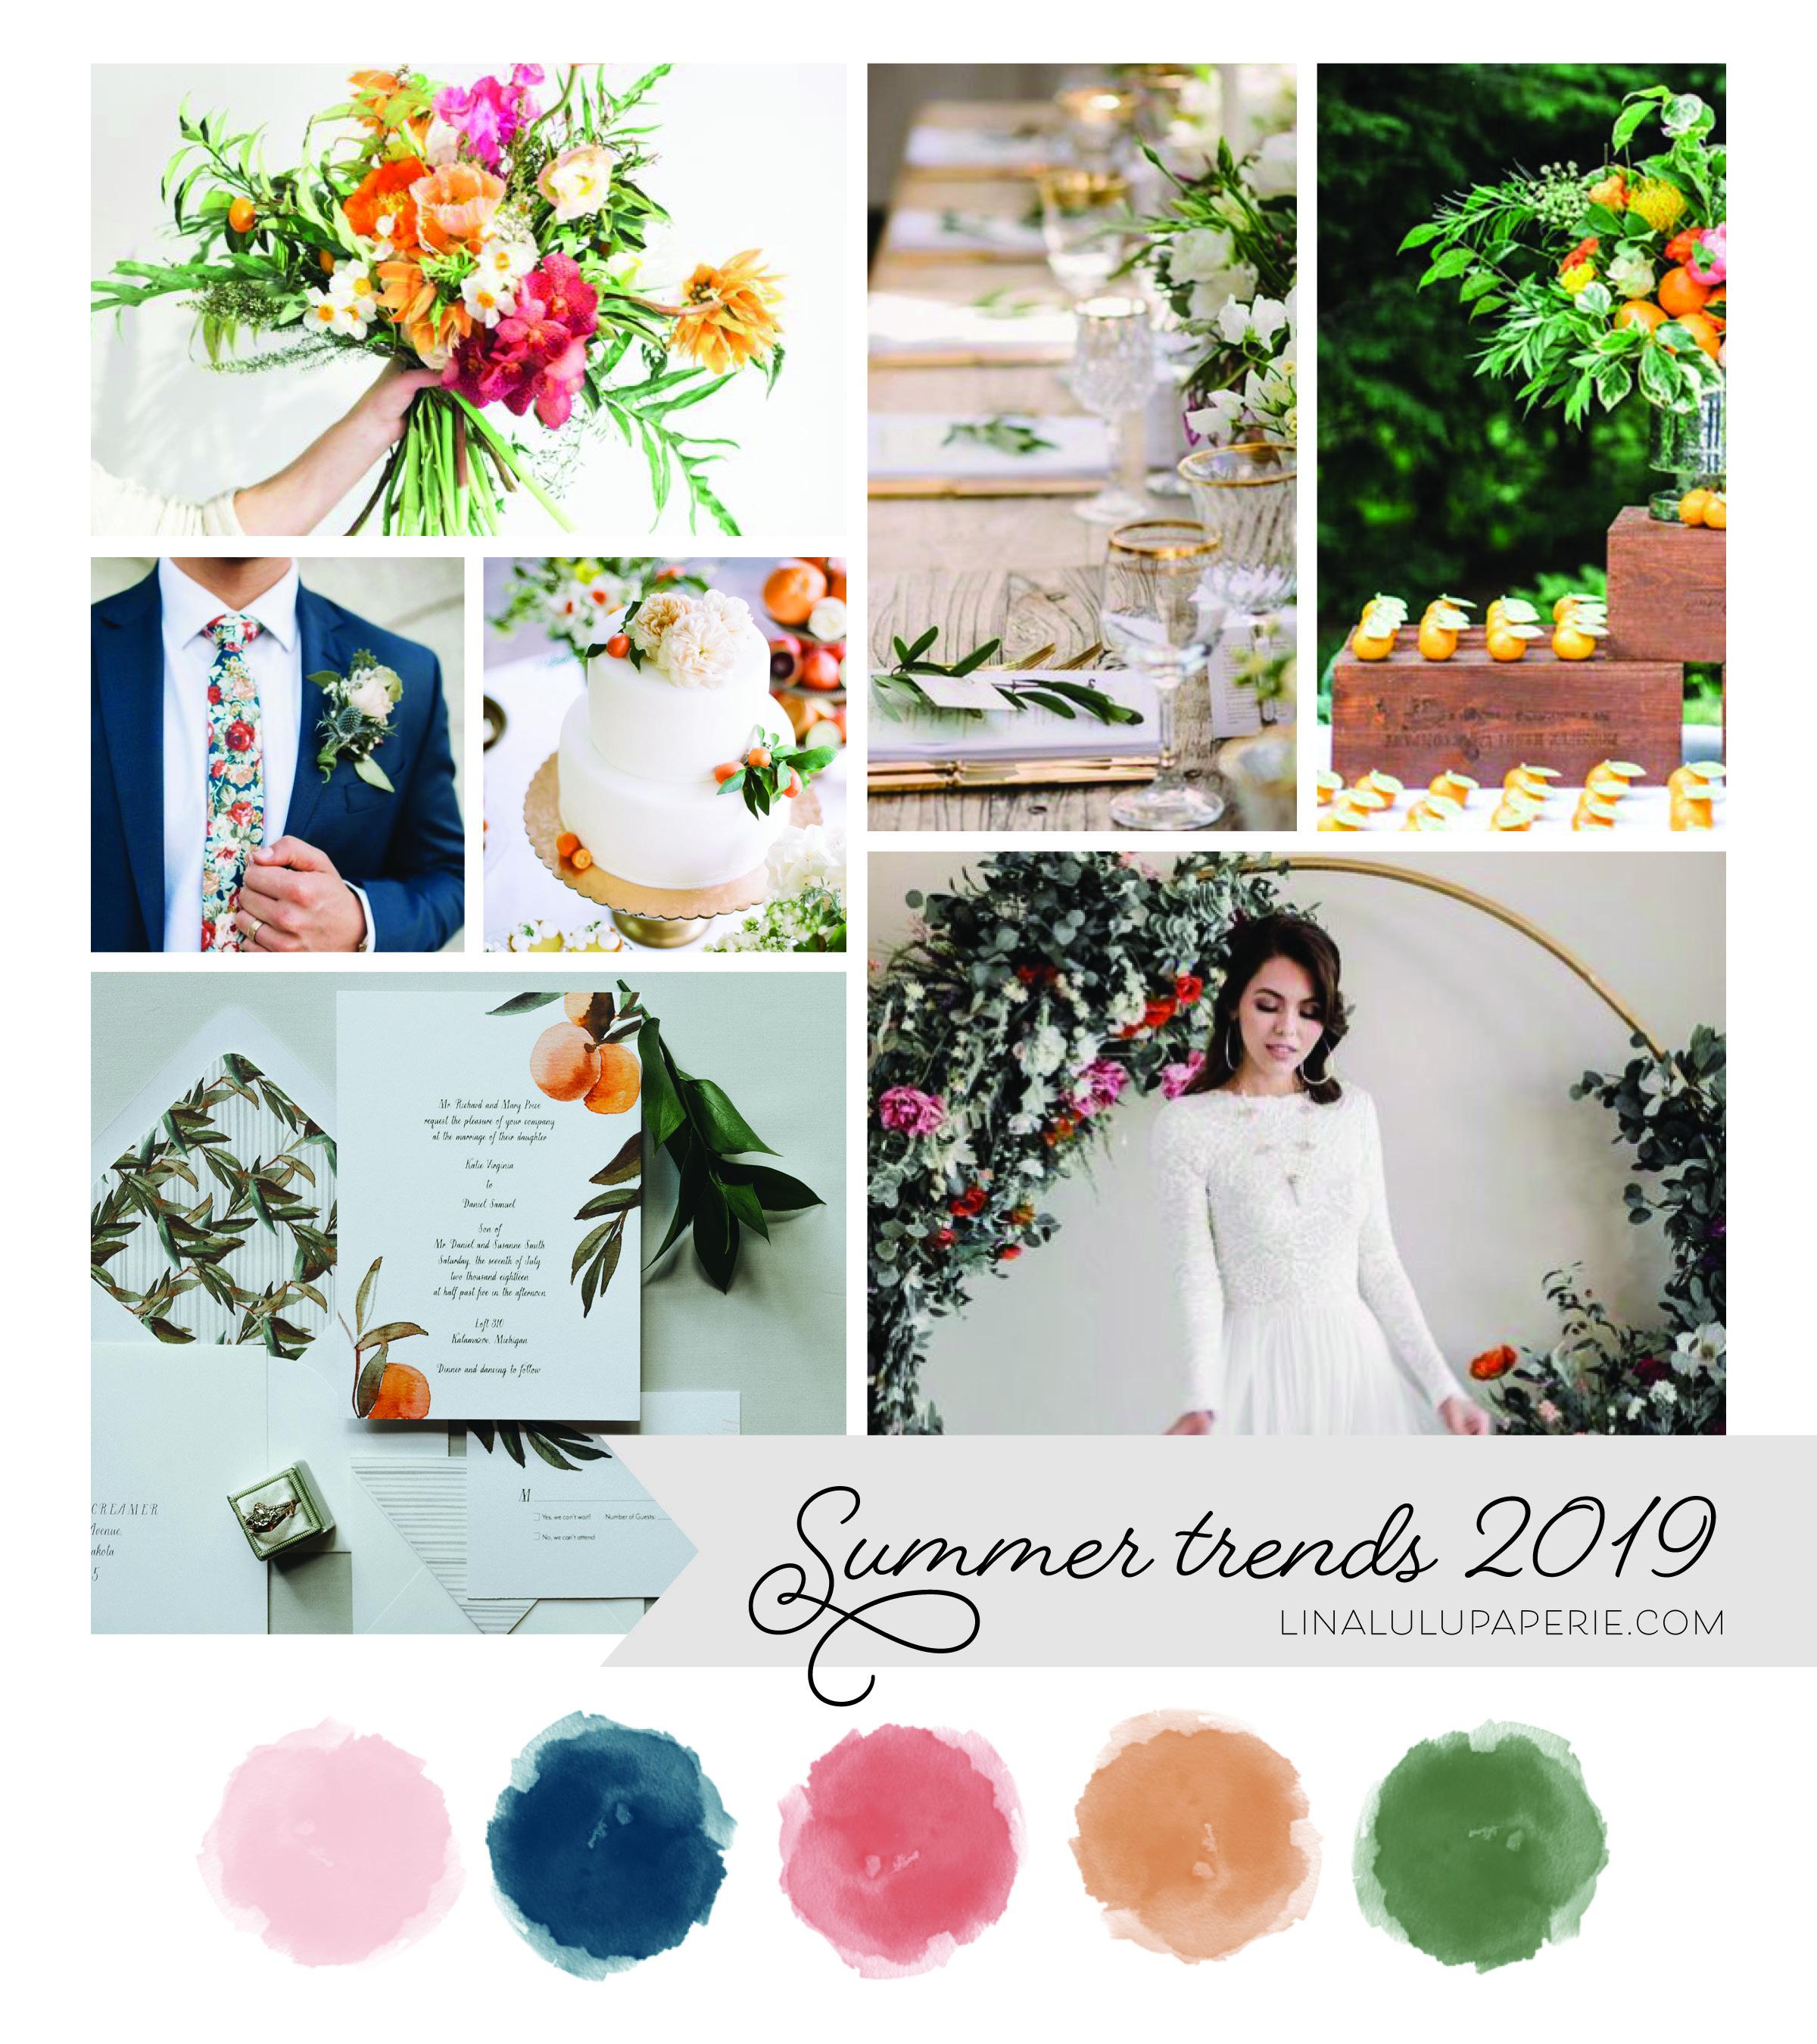 BlogImage_Summercolors.jpg